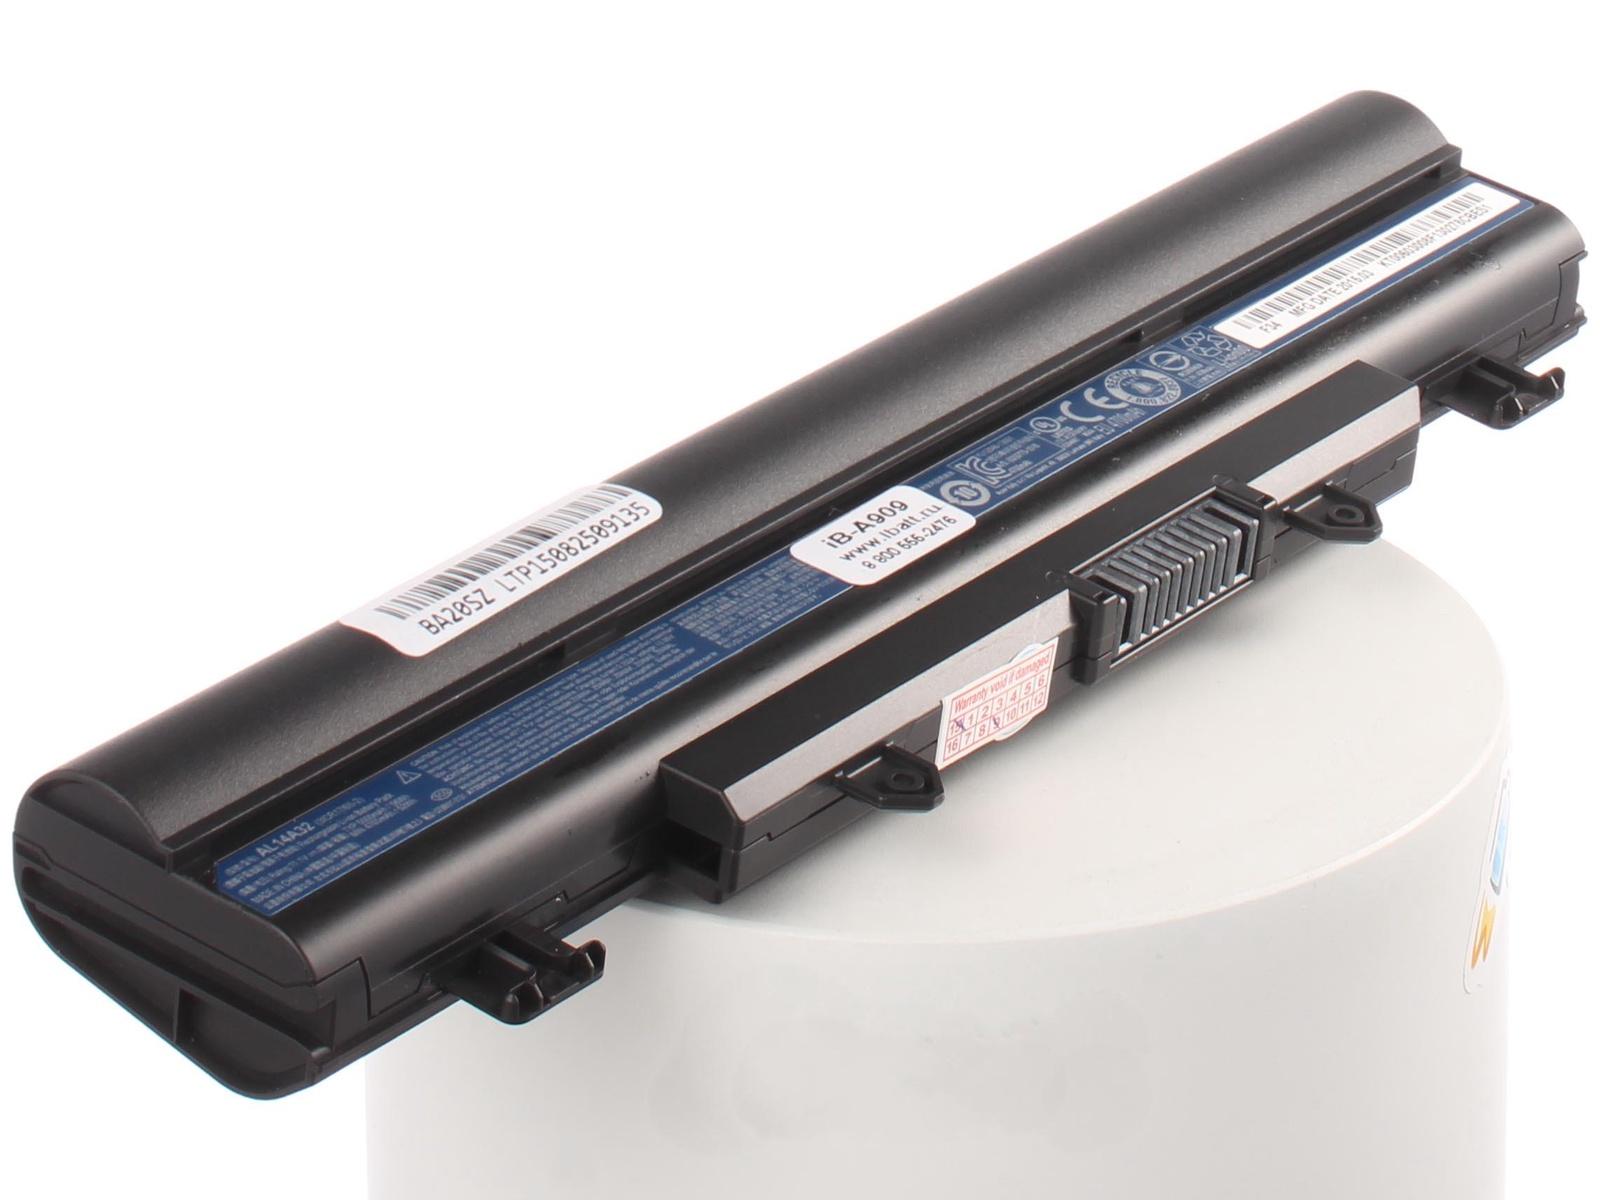 Аккумулятор для ноутбука iBatt для Acer Aspire E5-521G-66UQ, ASPIRE E5-571-3980, Aspire E5-571G-59UY, Aspire E5-571G-36L5, ASPIRE E5-511-C3A5, Aspire E5-571G-34BF, Aspire V3-572G-38YD, ASPIRE E5-511-C5B8, Aspire E5-511P ноутбук acer aspire e5 576g 31sj nx gvber 031